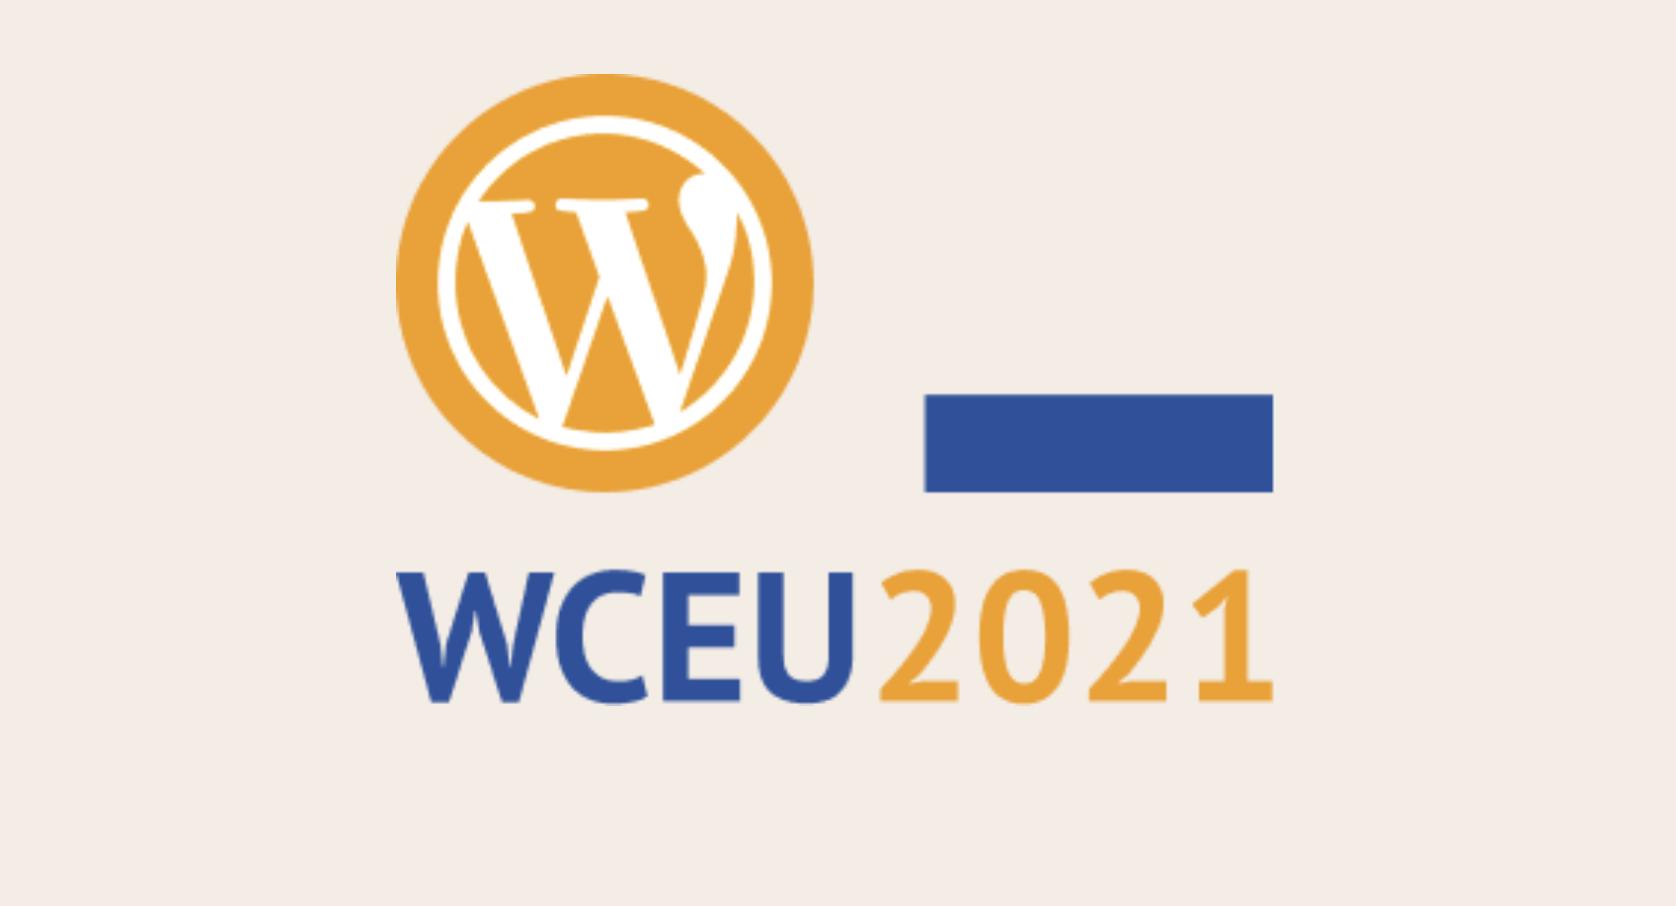 Wordcamp-europe-gos-virtual-for 2021面对面的会议到2022年的简历WordCamp Europe进入2021年虚拟化,个人会议恢复2022年